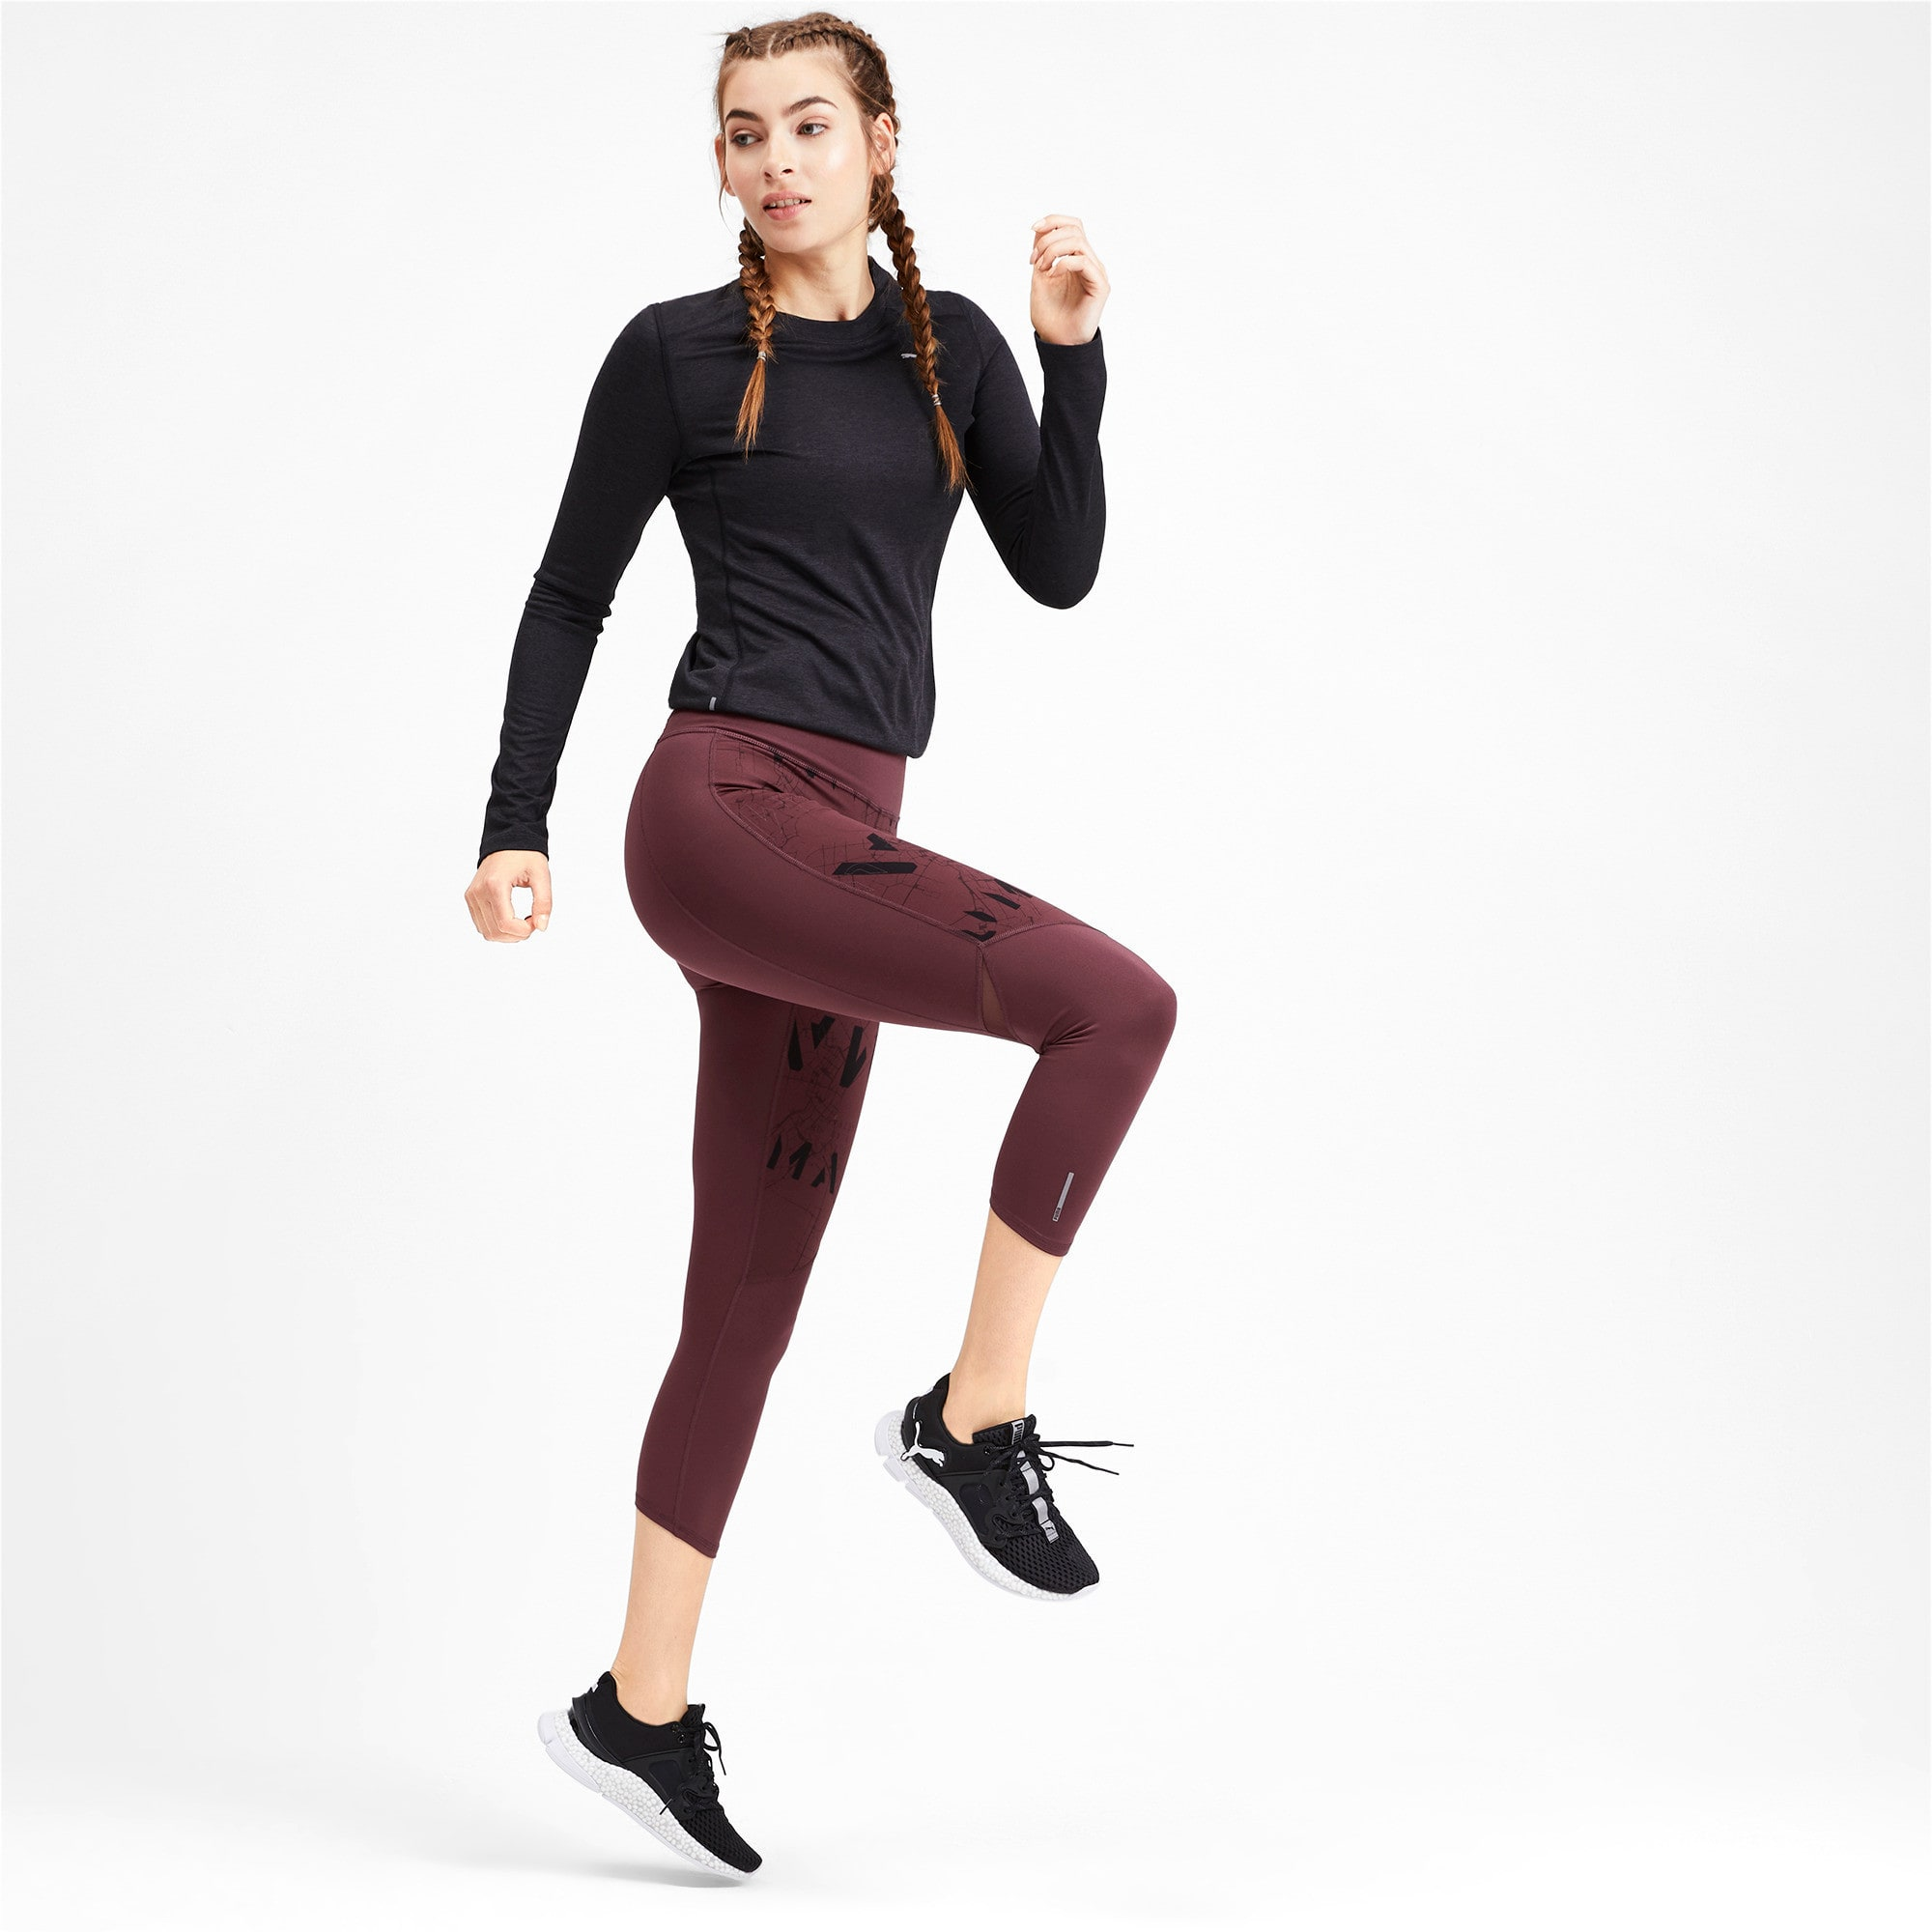 Thumbnail 3 of Graphic 3/4 Women's Running Tights, Vineyard Wine-Reflective, medium-IND